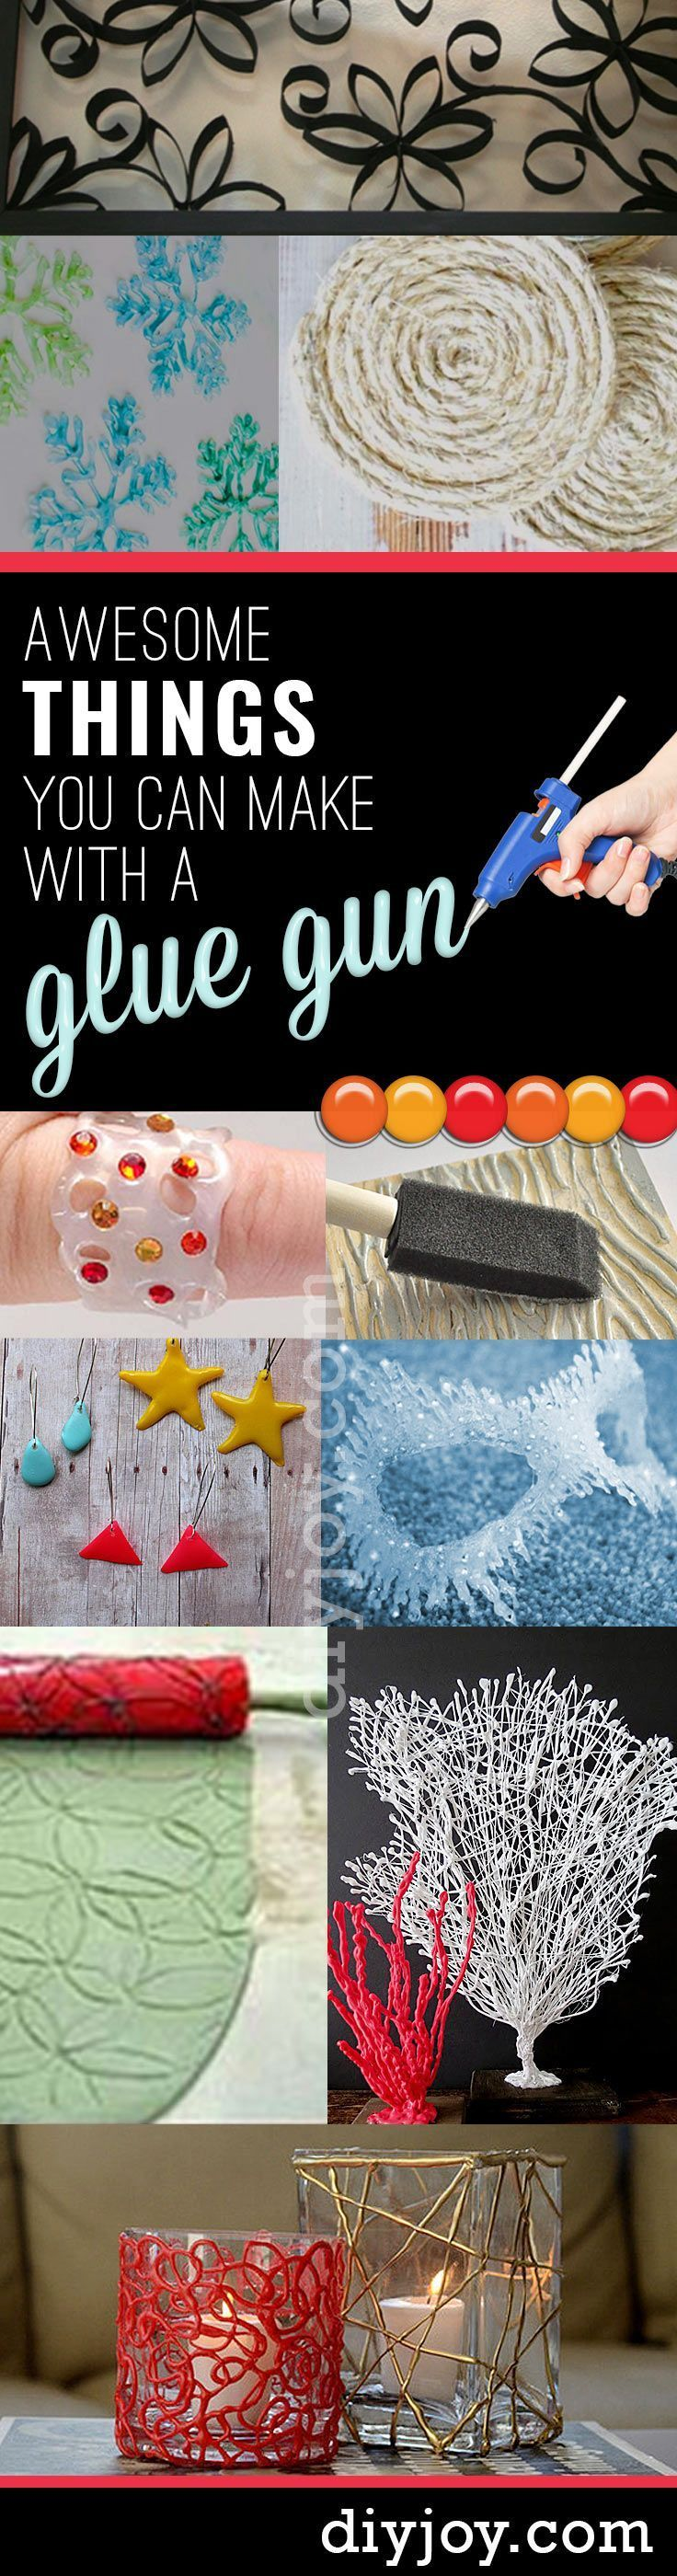 Best Hot Glue Gun Crafts, DIY Projects and Arts and Crafts Ideas Using Glue Gun Sticks | Creative DIY Ideas for Teens diyjoy.com/...